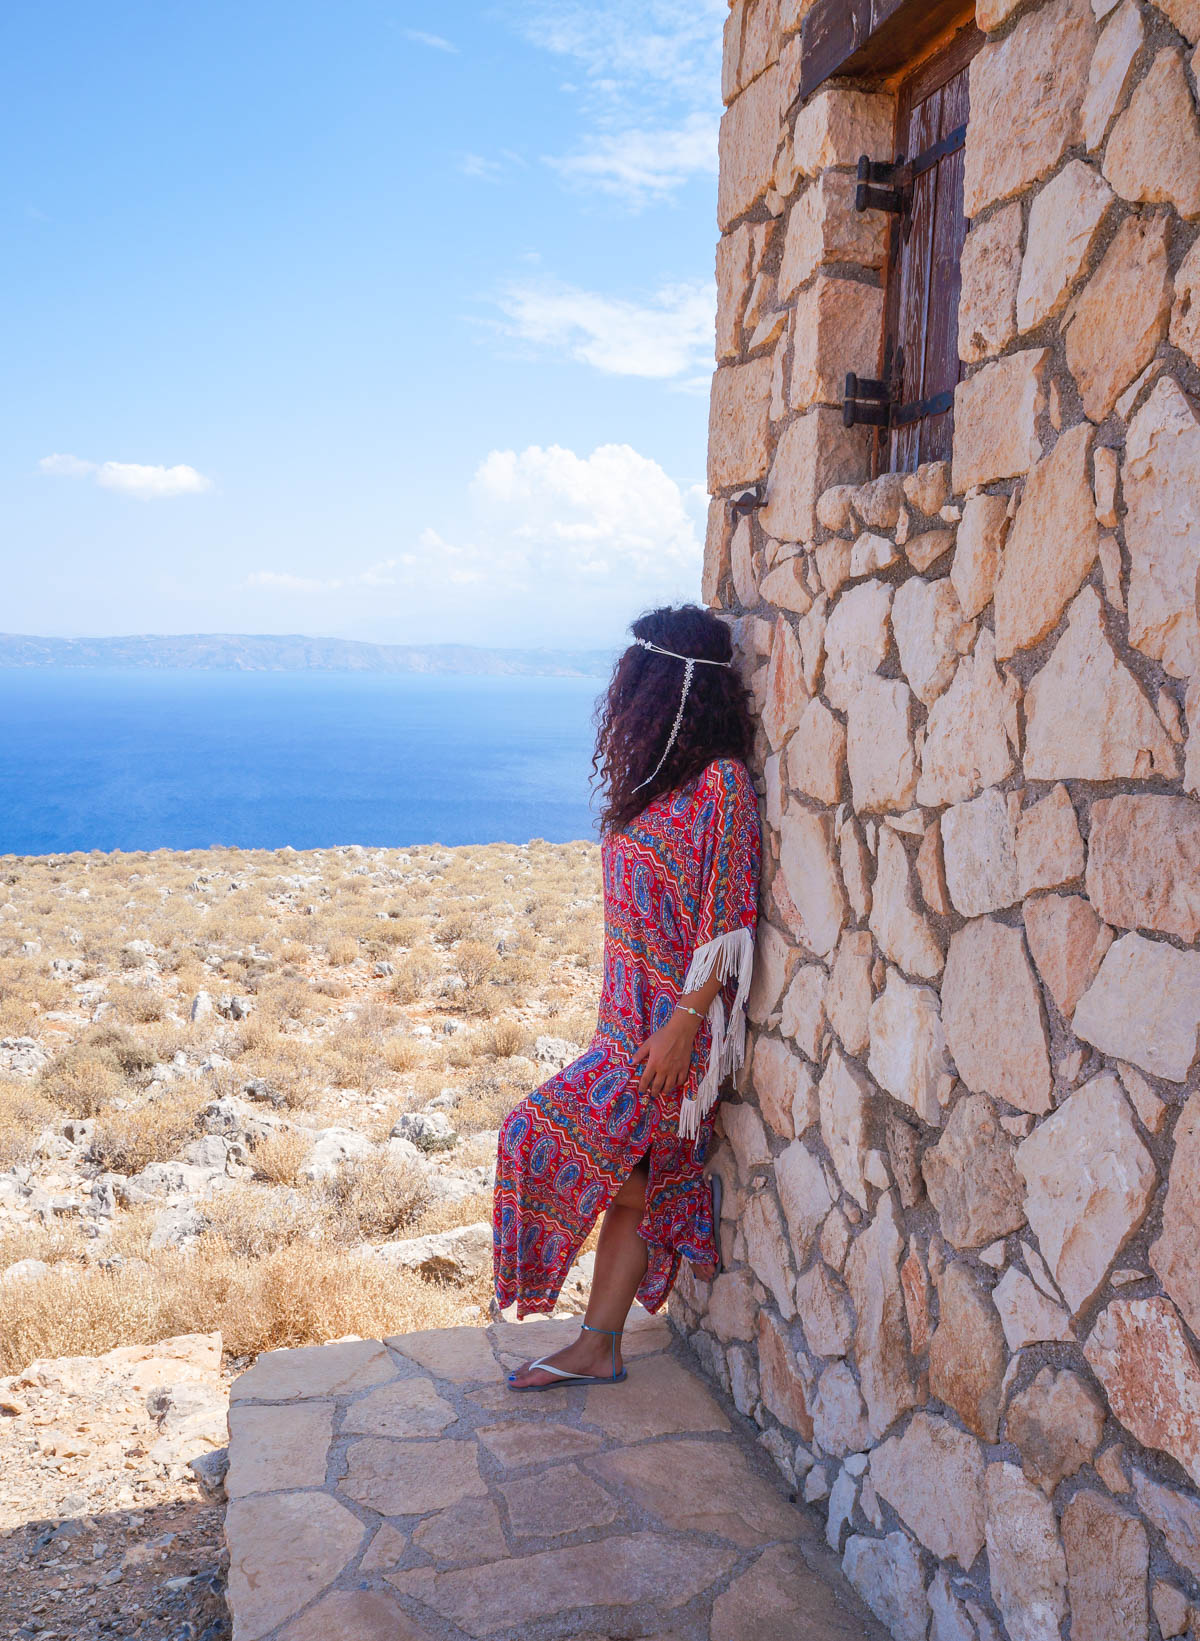 mpalos-beach-crete-greece-la-vie-en-blog-all-rights-reserved-20